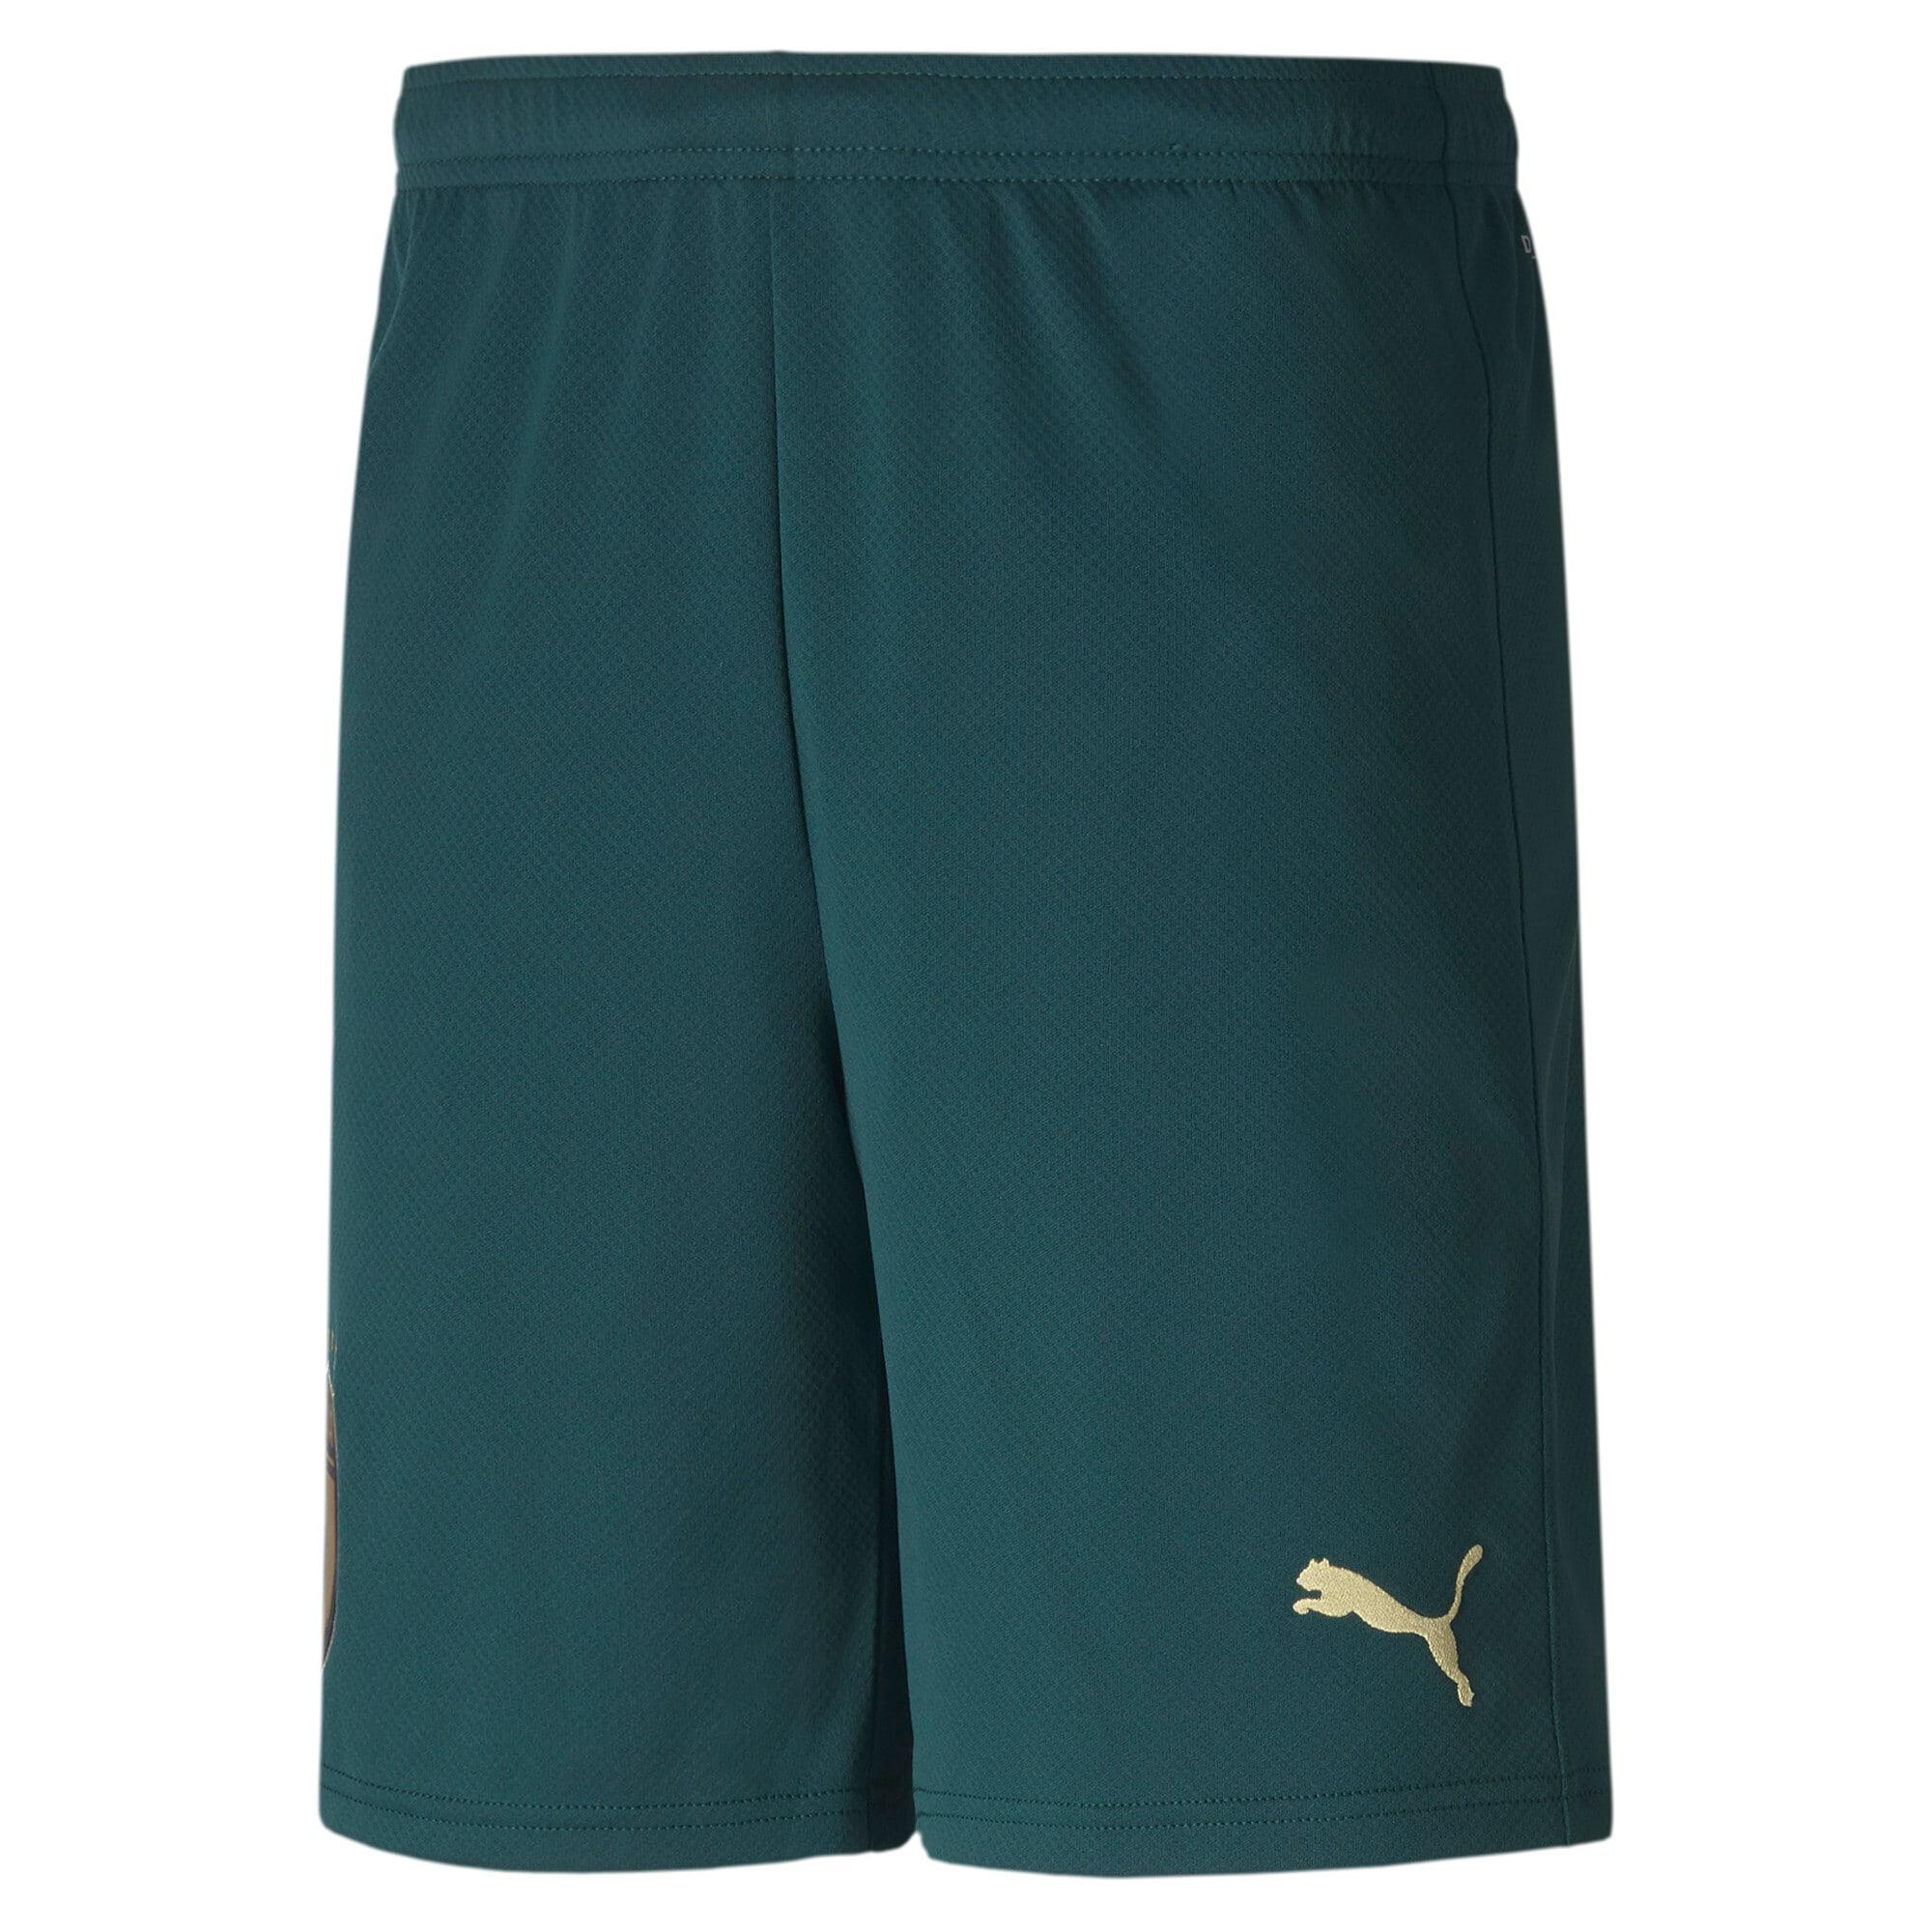 Thumbnail 1 of FIGC Men's Third Replica Shorts, Ponderosa Pine-Peacoat, medium